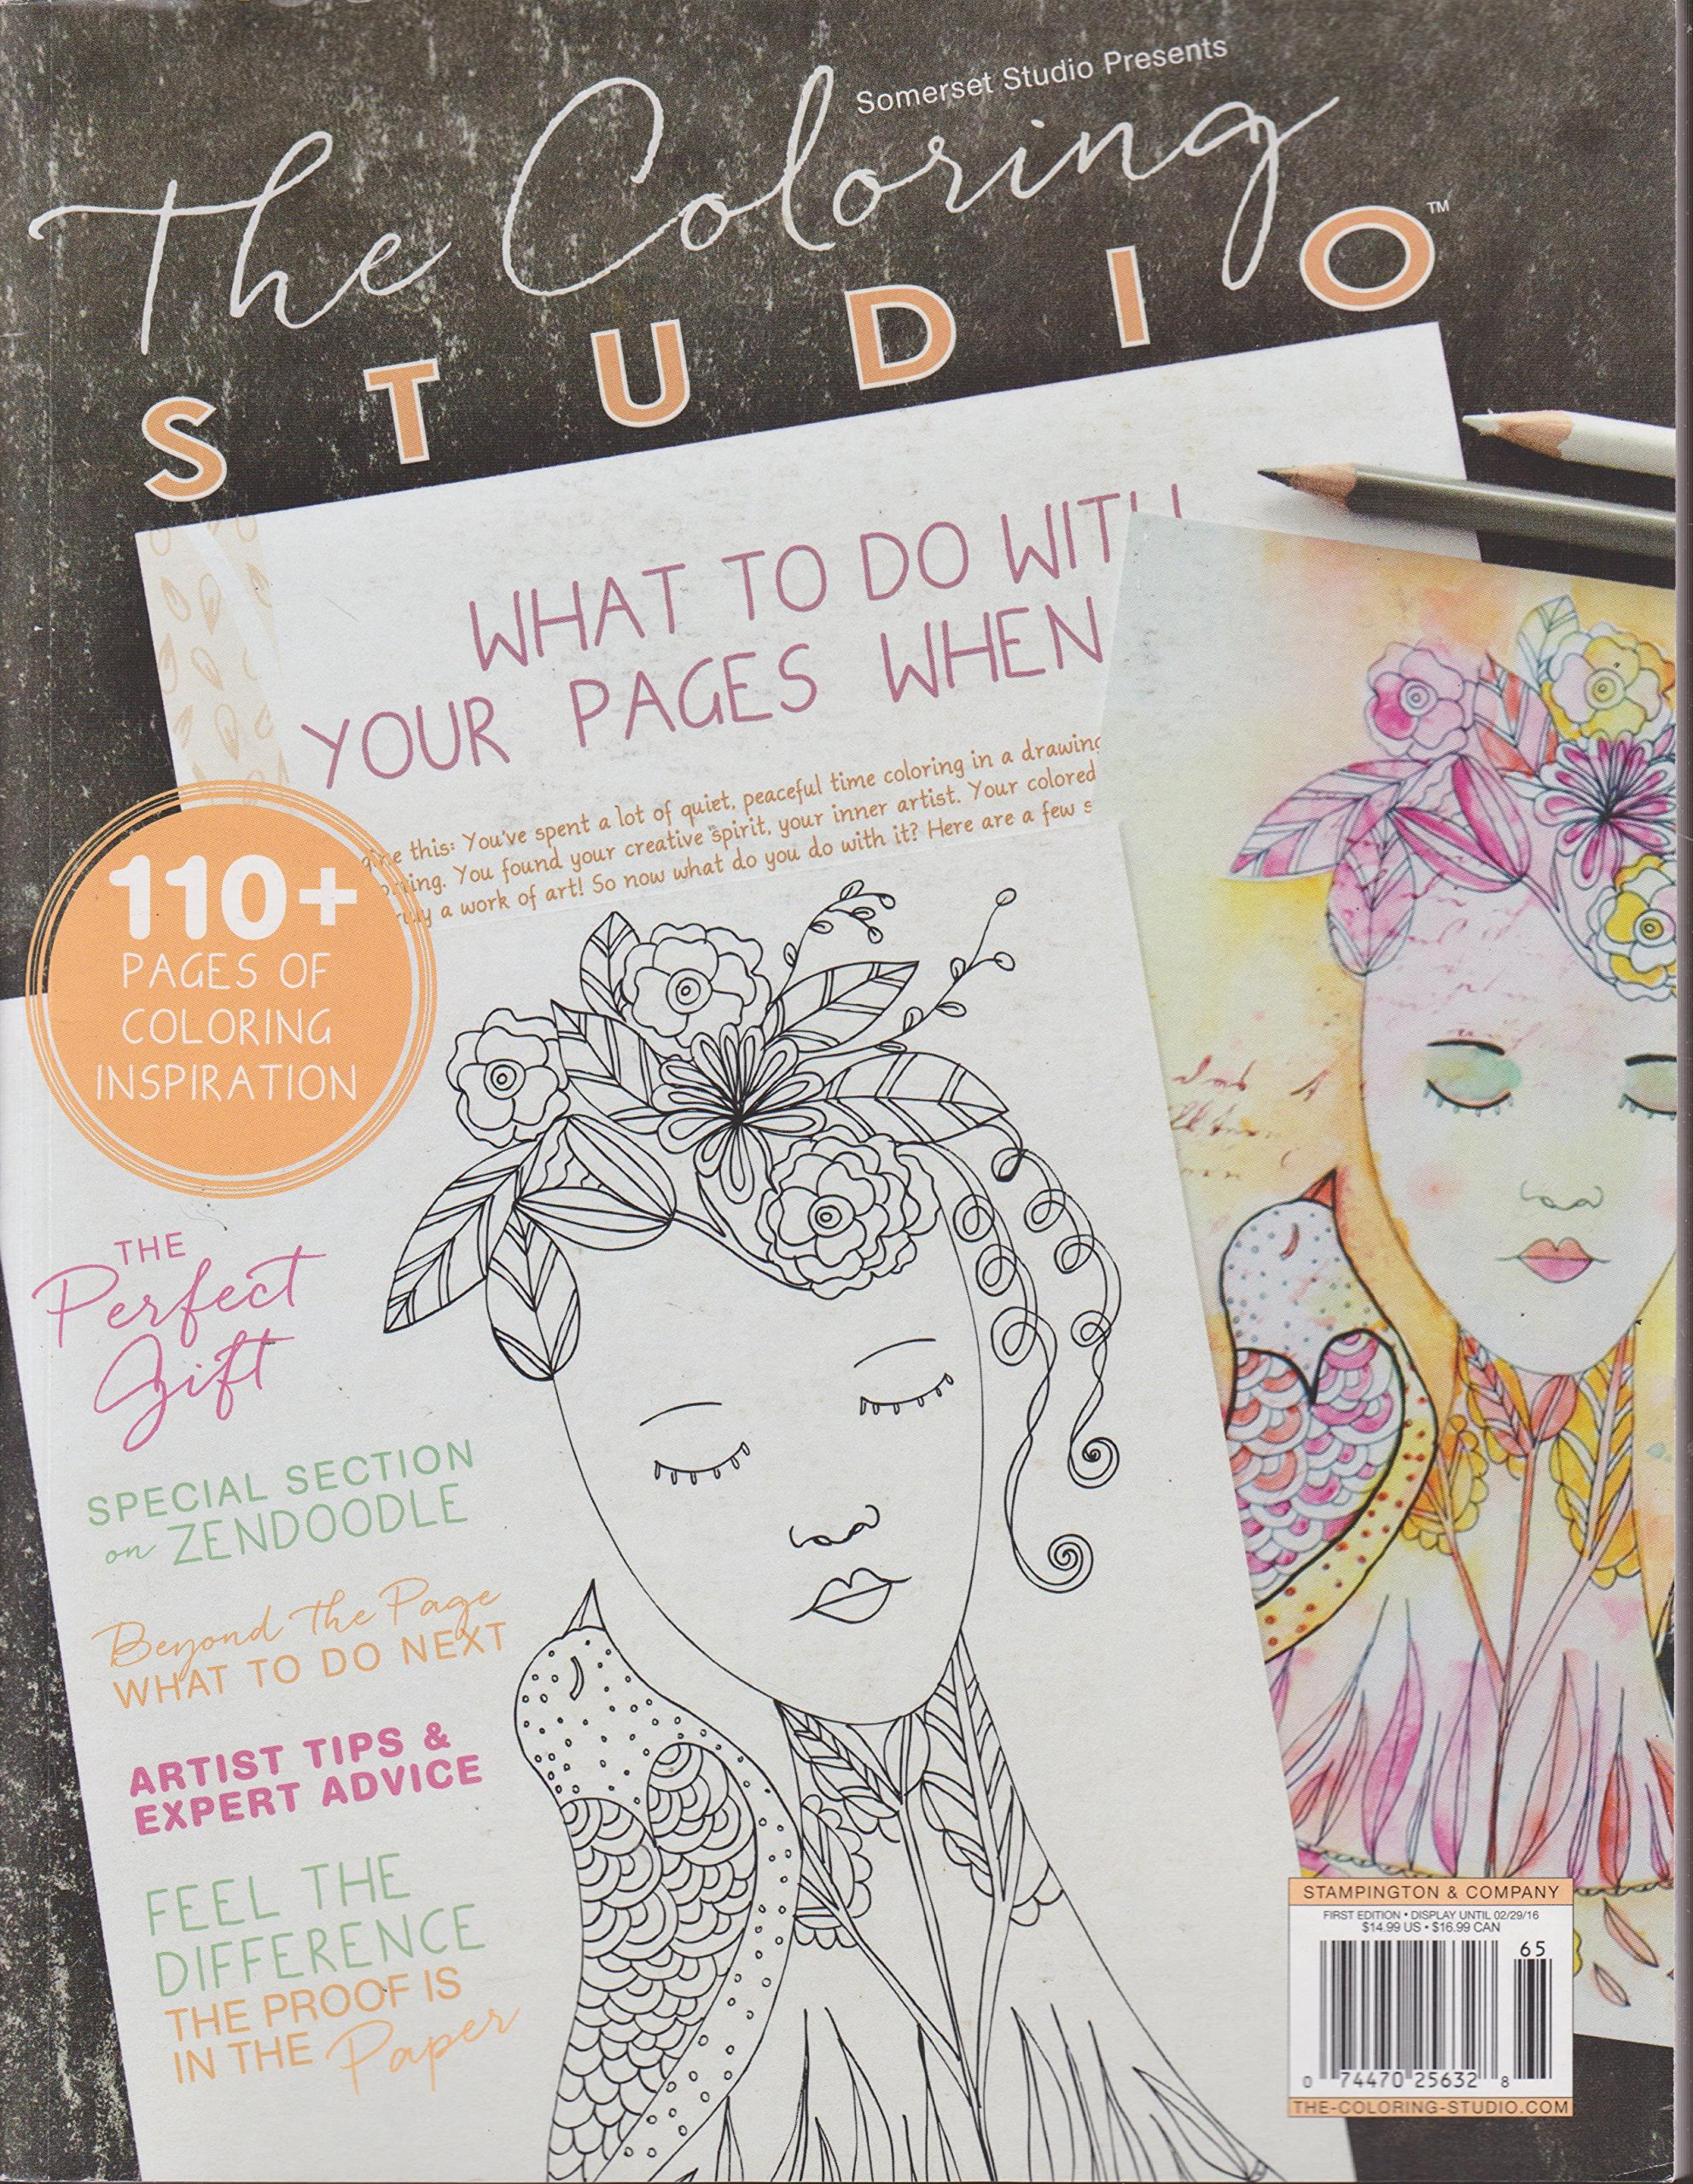 Somerset Studio Presents The Coloring Magazine 1st Edition Amazon Books